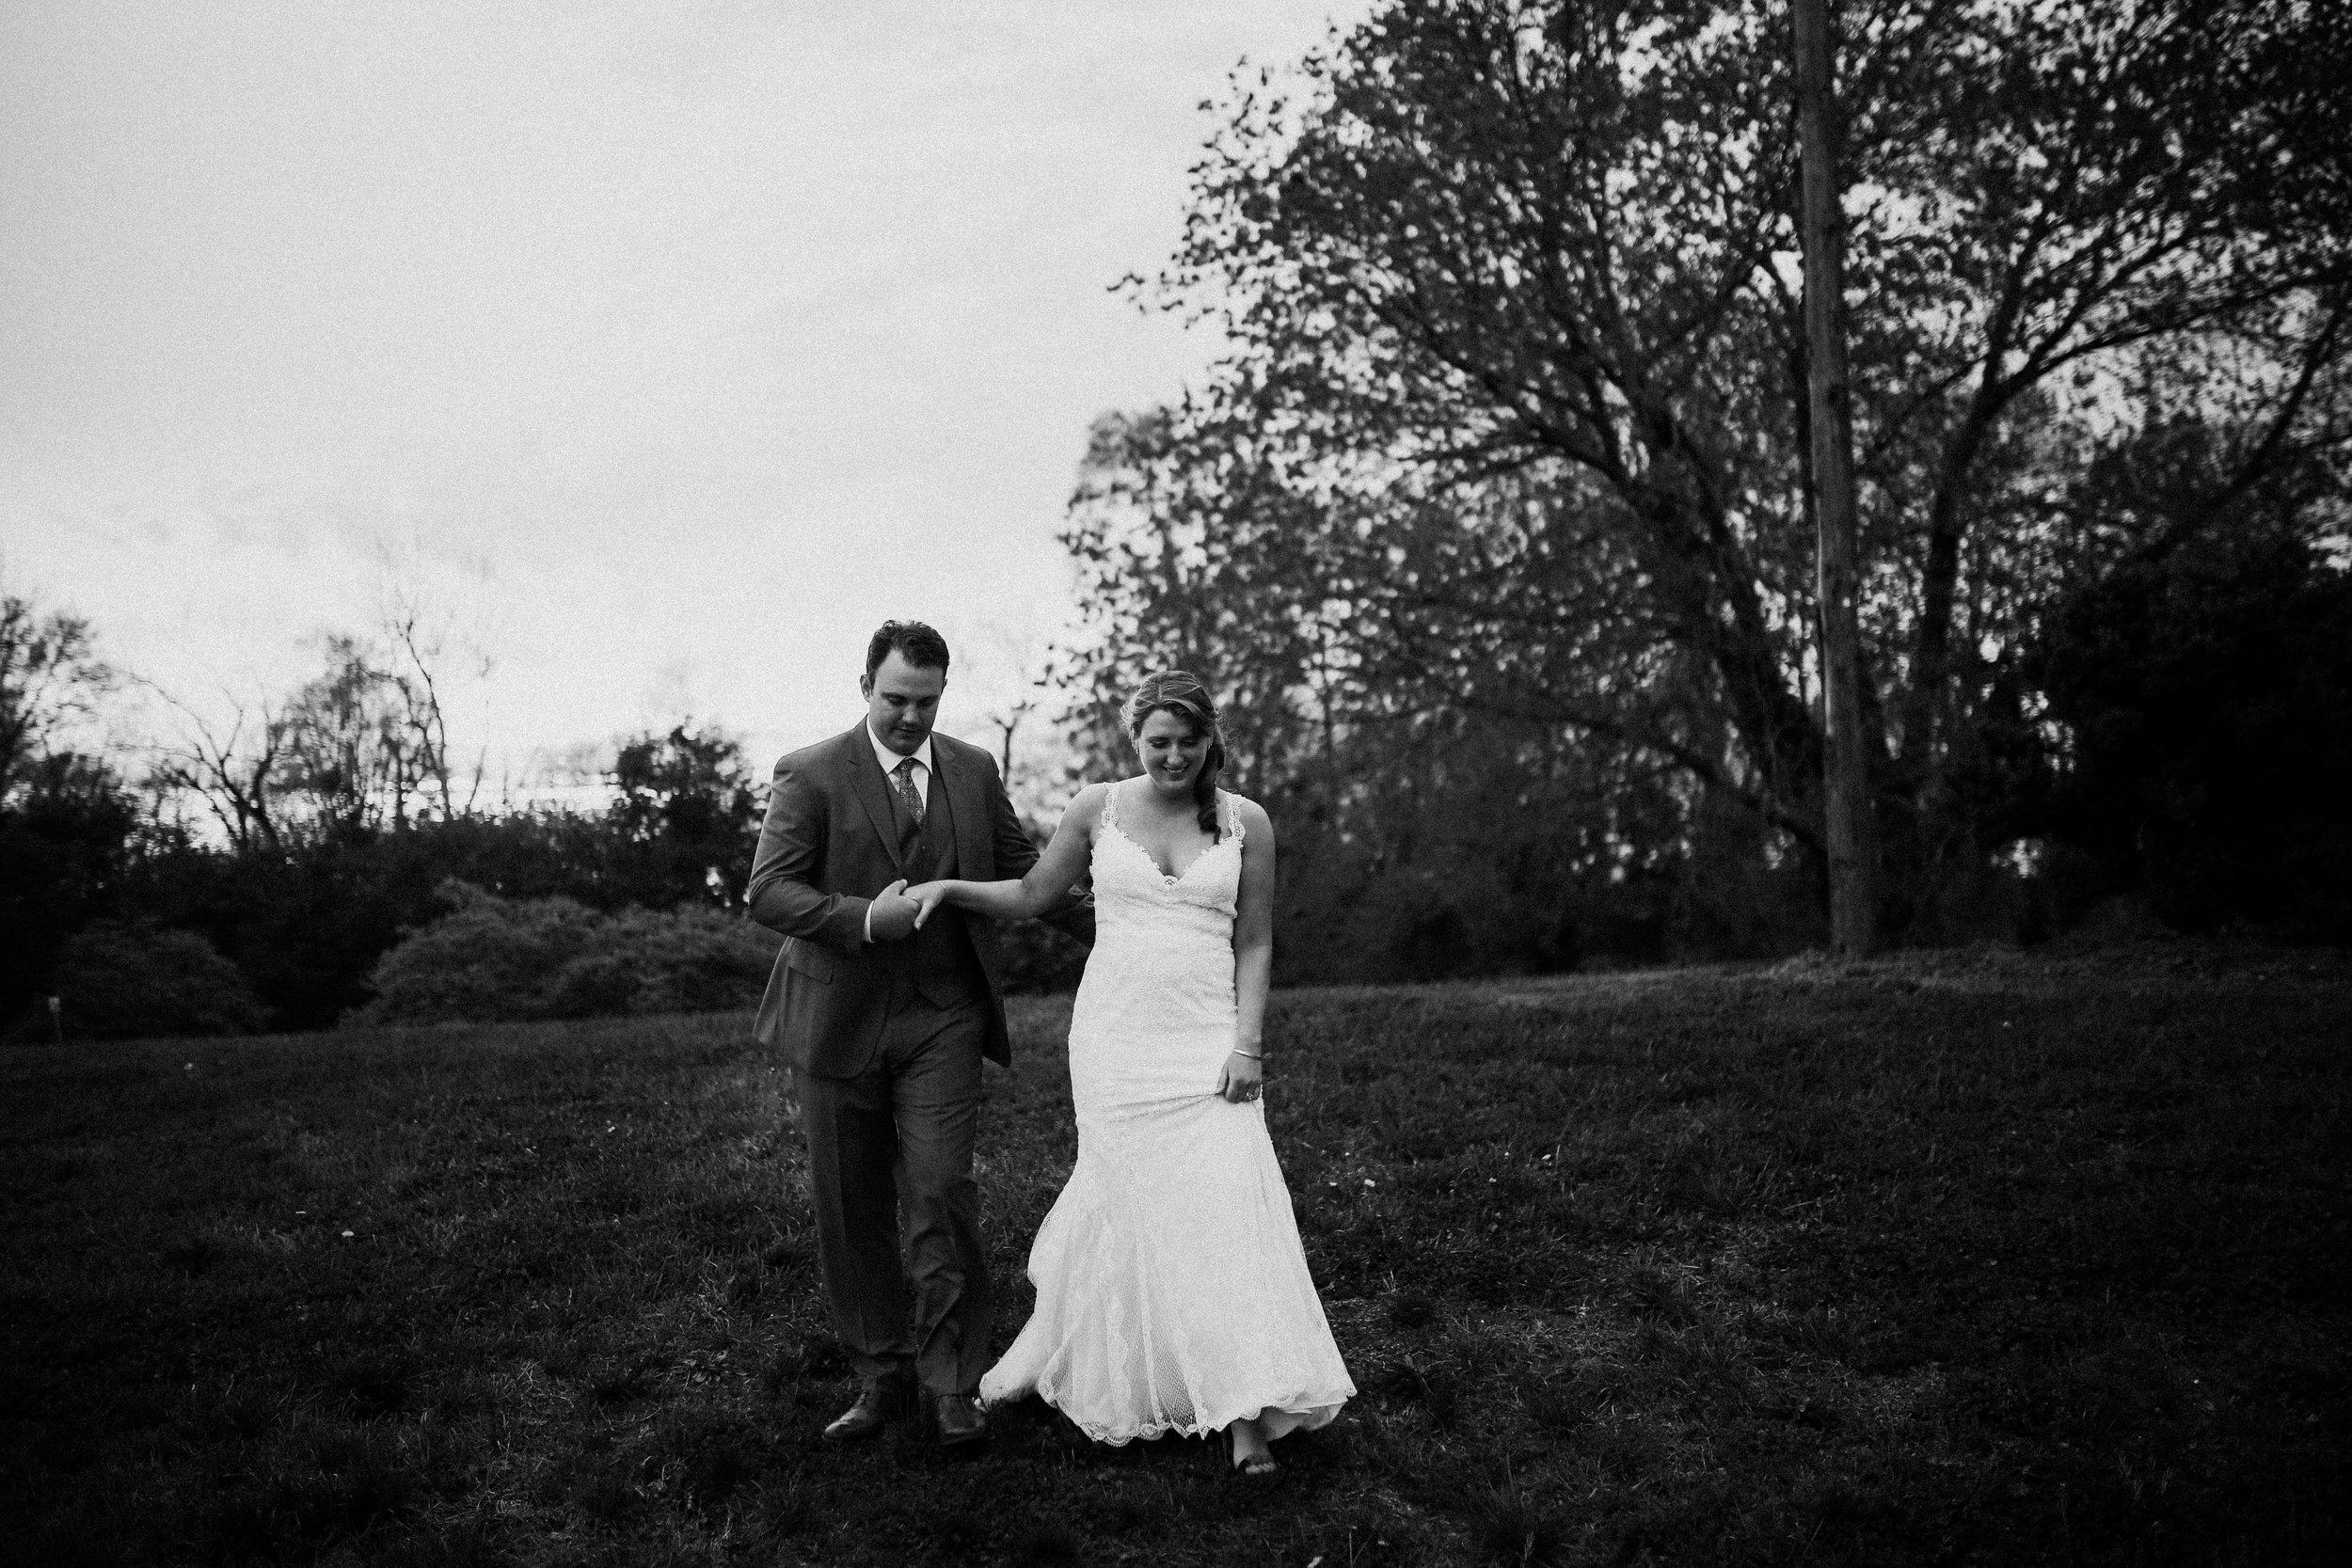 TheGreens_Married_2019-538.jpg